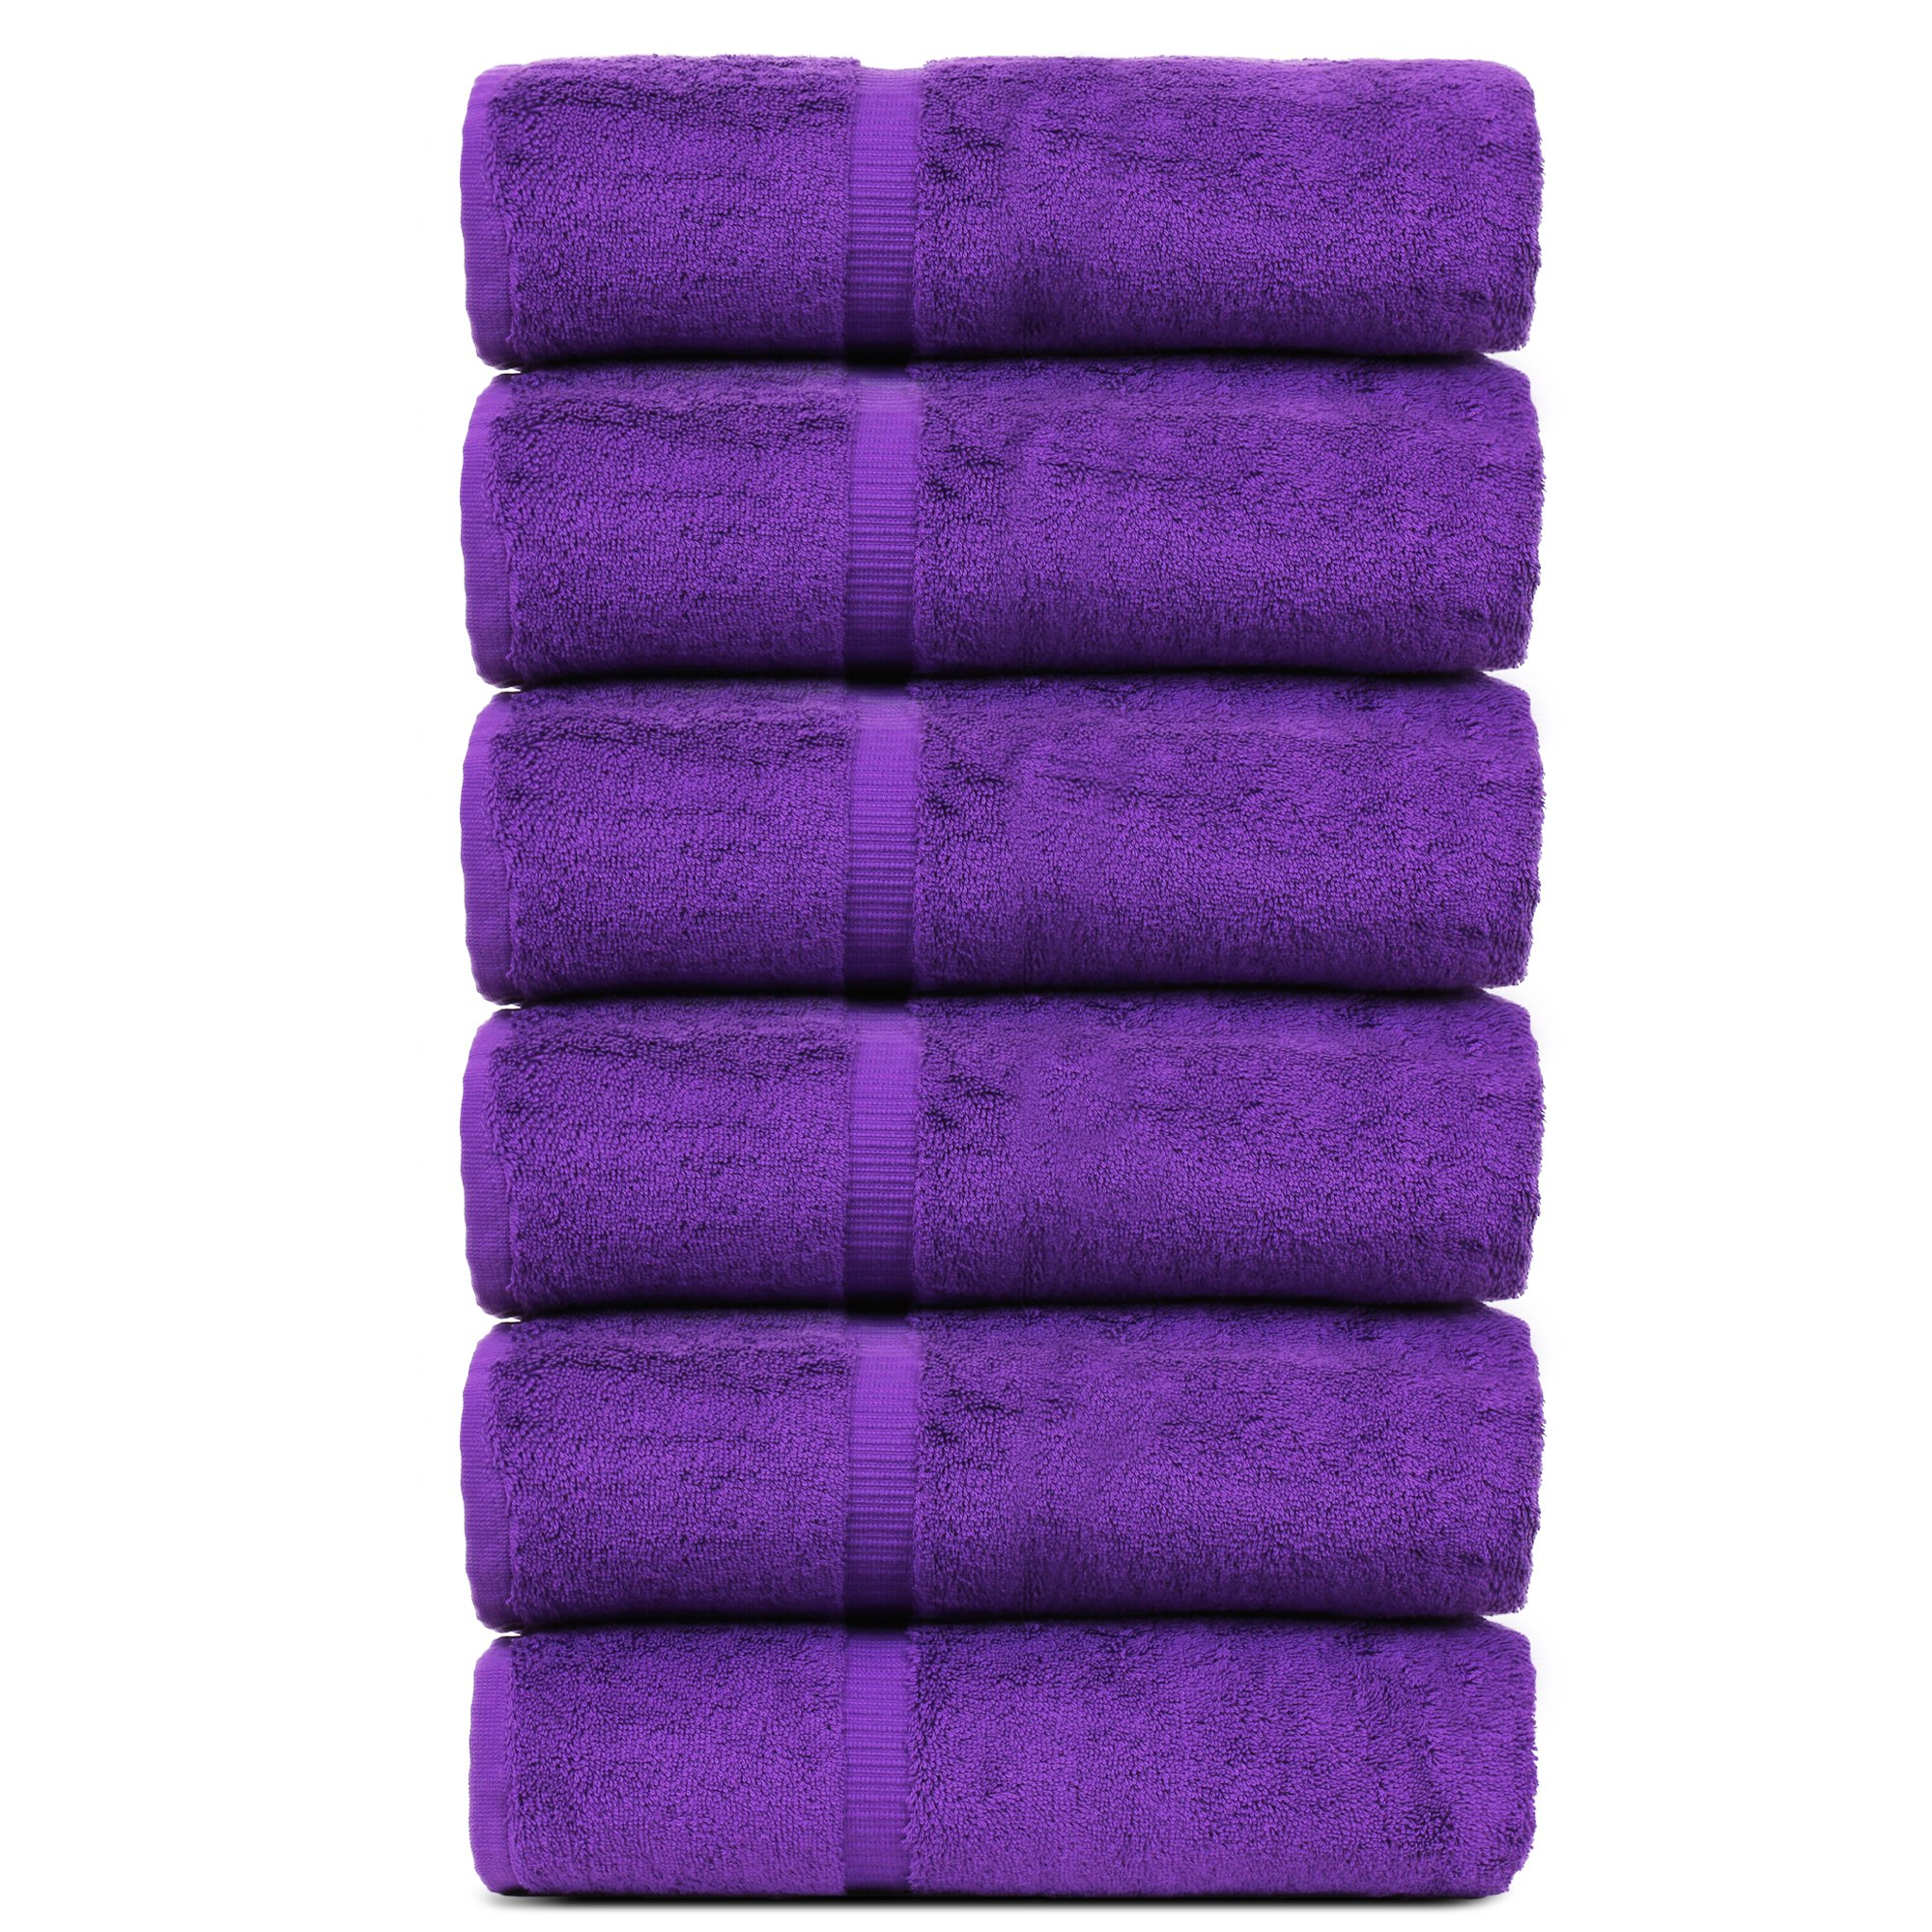 BC BARE COTTON Luxury Hotel & Spa Towel Turkish Cotton Hand Towels - Eggplant - Dobby Border - Set of 6